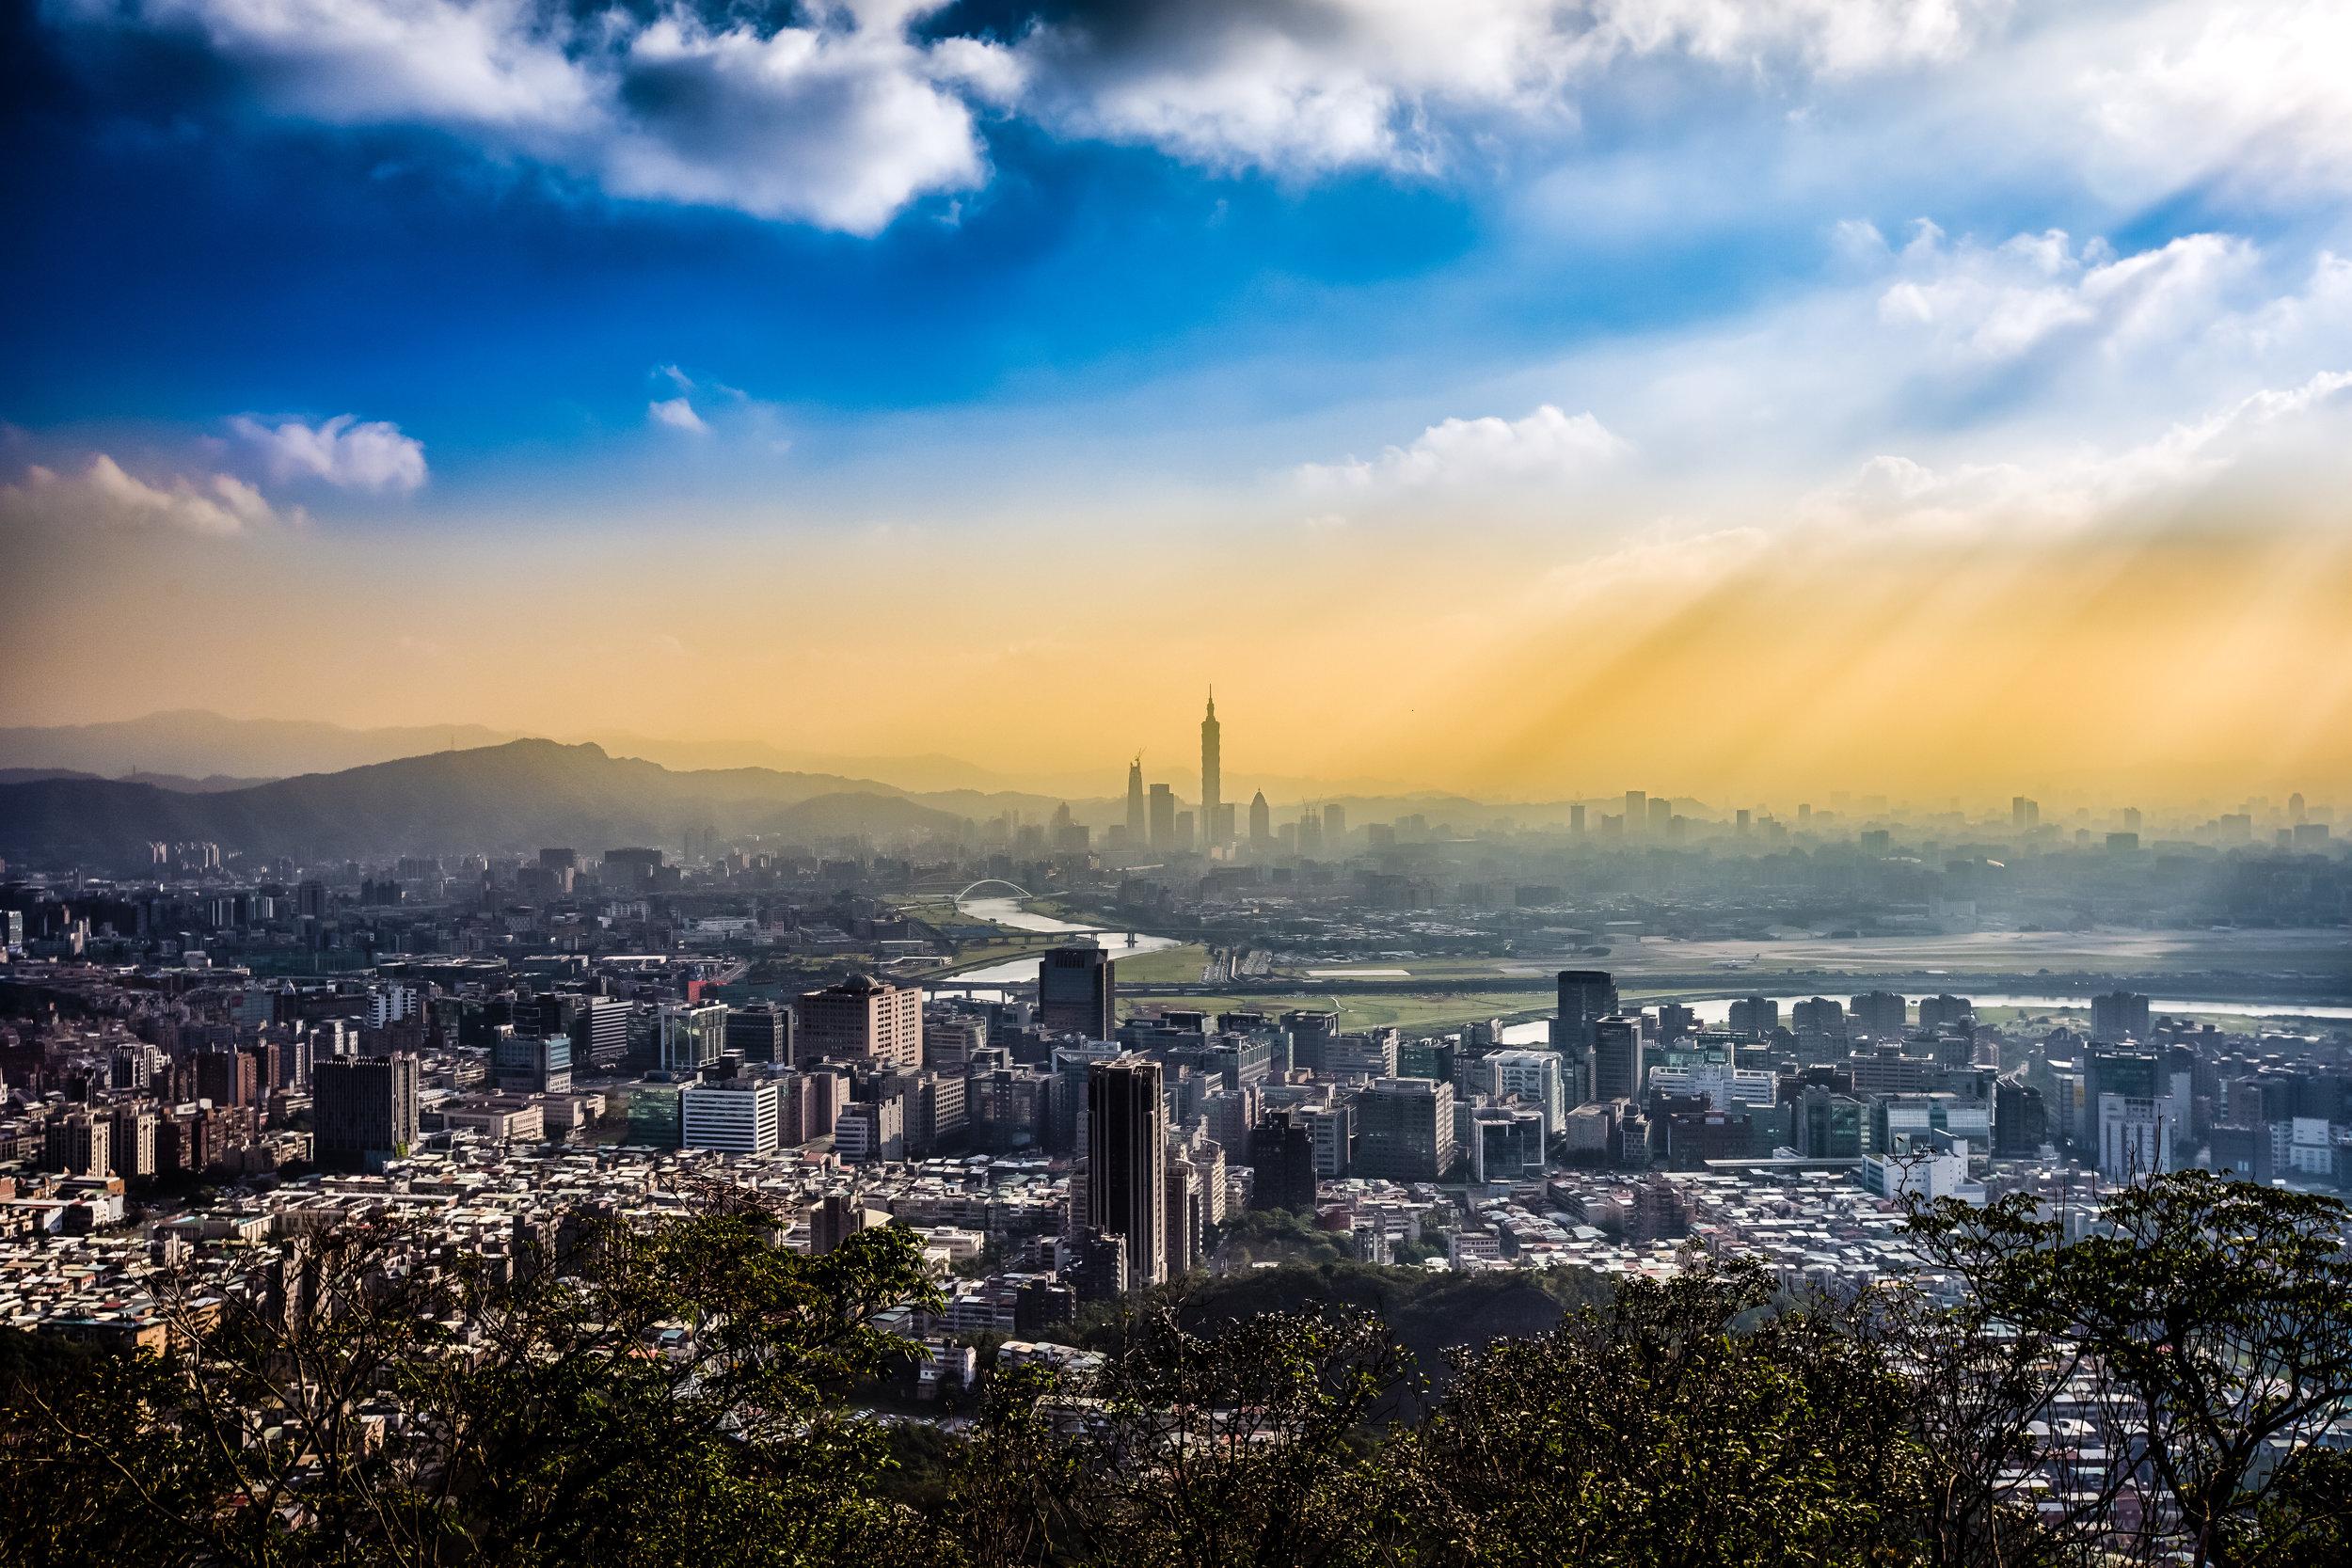 The sun setting on Taipei City